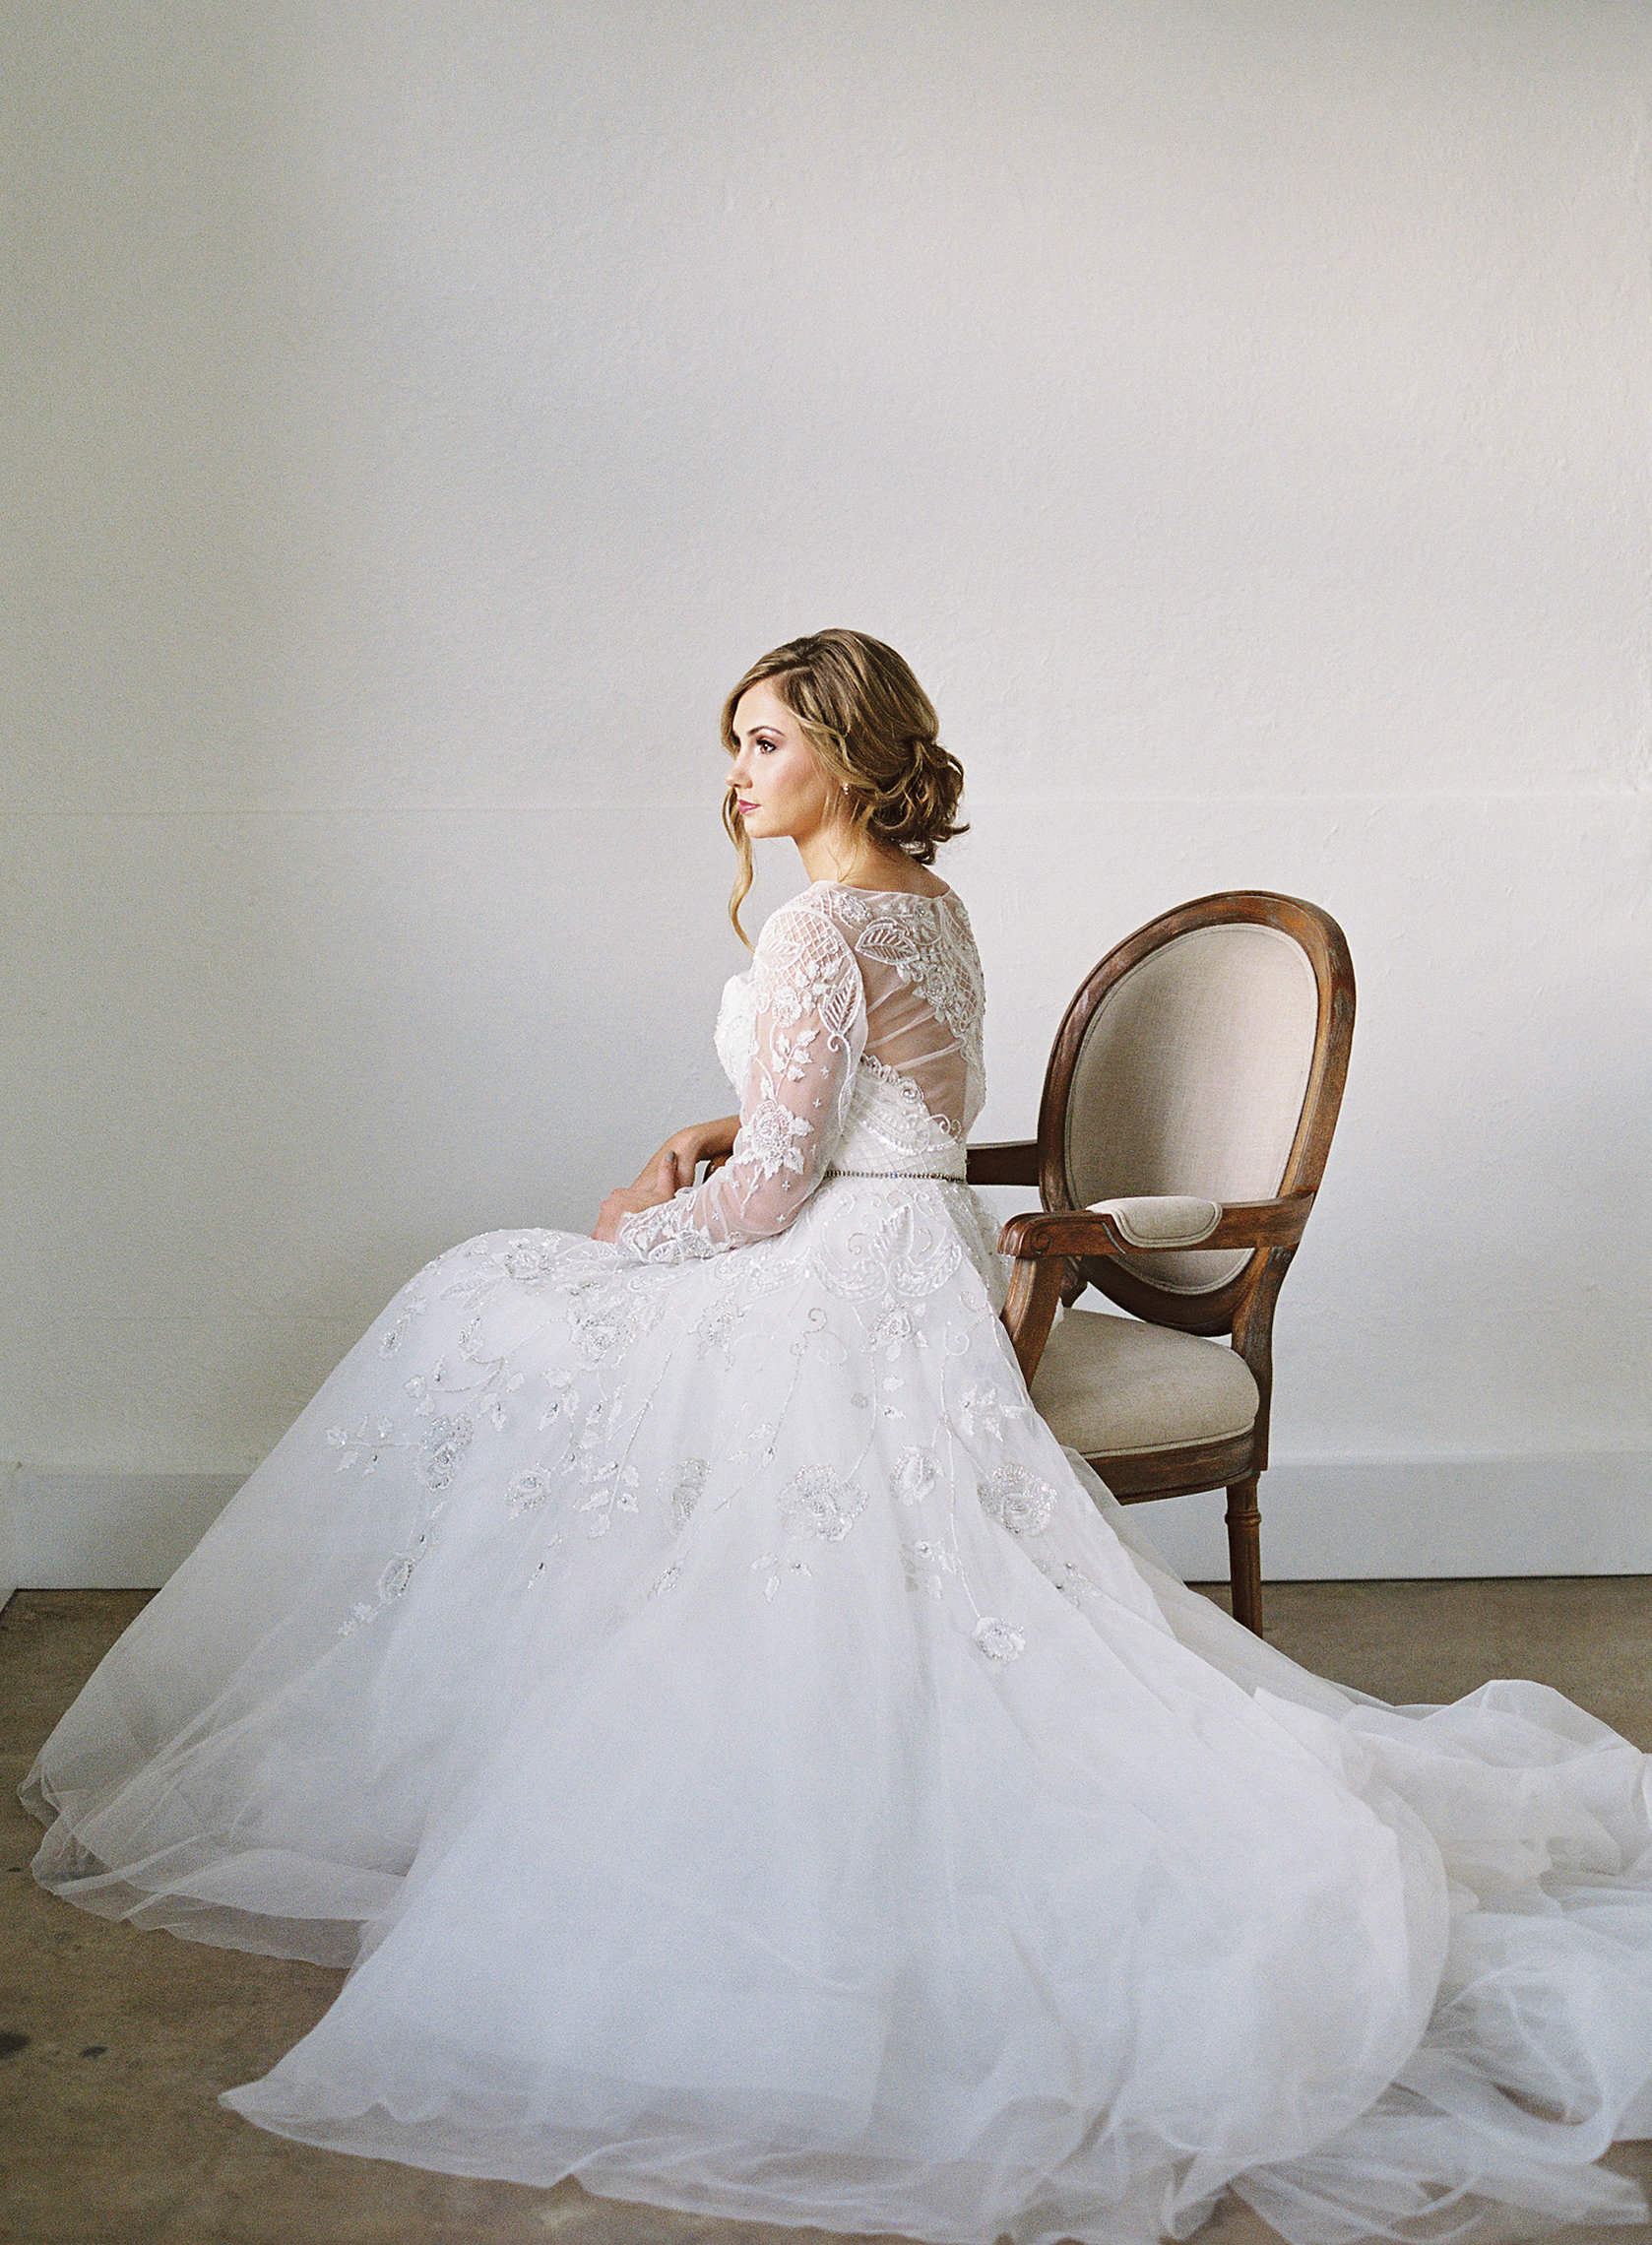 Reynolda Barn - Allison Kuhn Photography0210.jpg